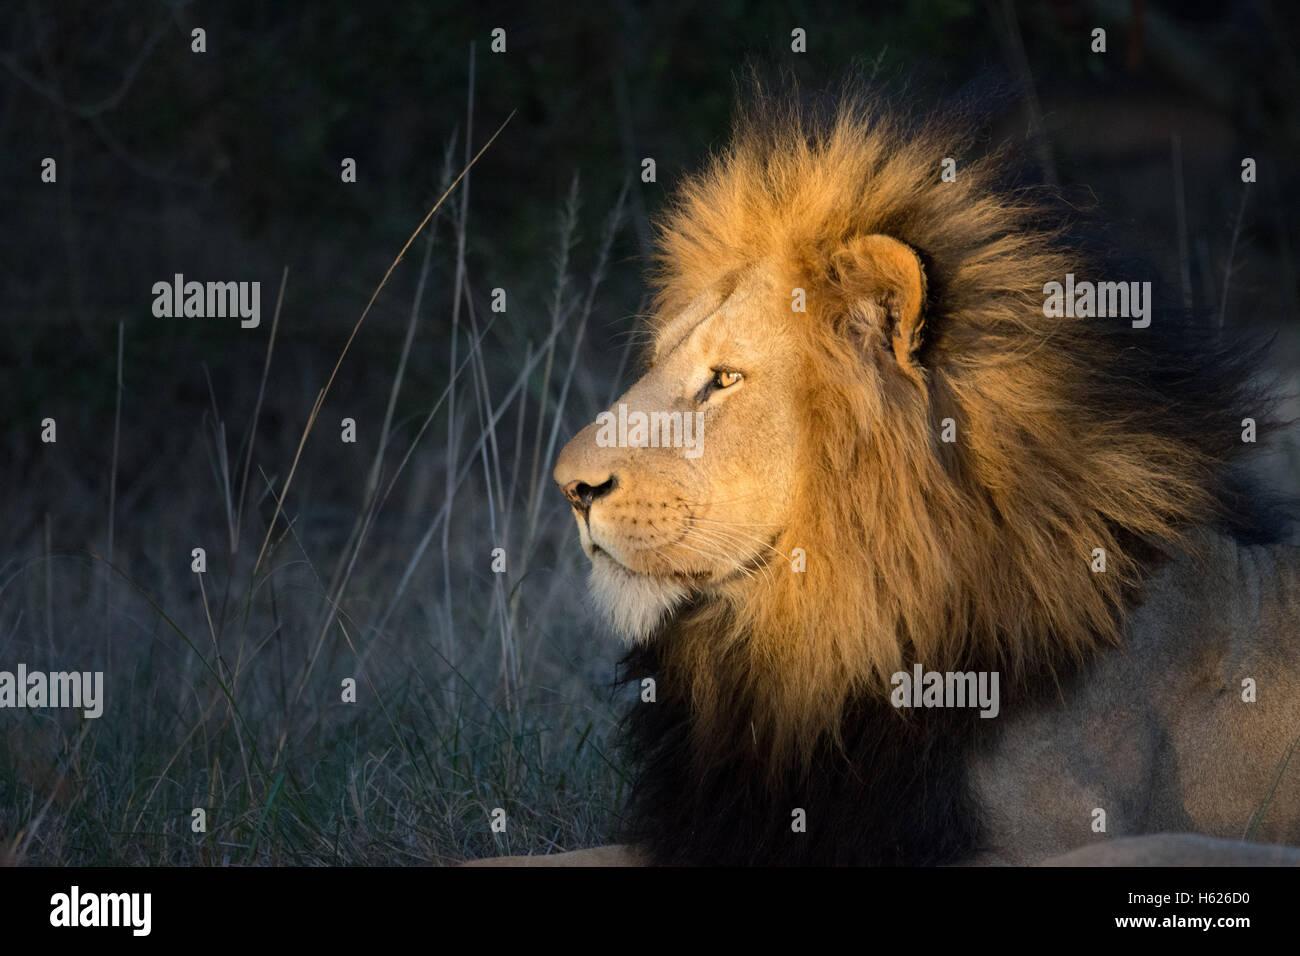 Lion resting, enjoying the setting sun. Side Profile - Stock Image